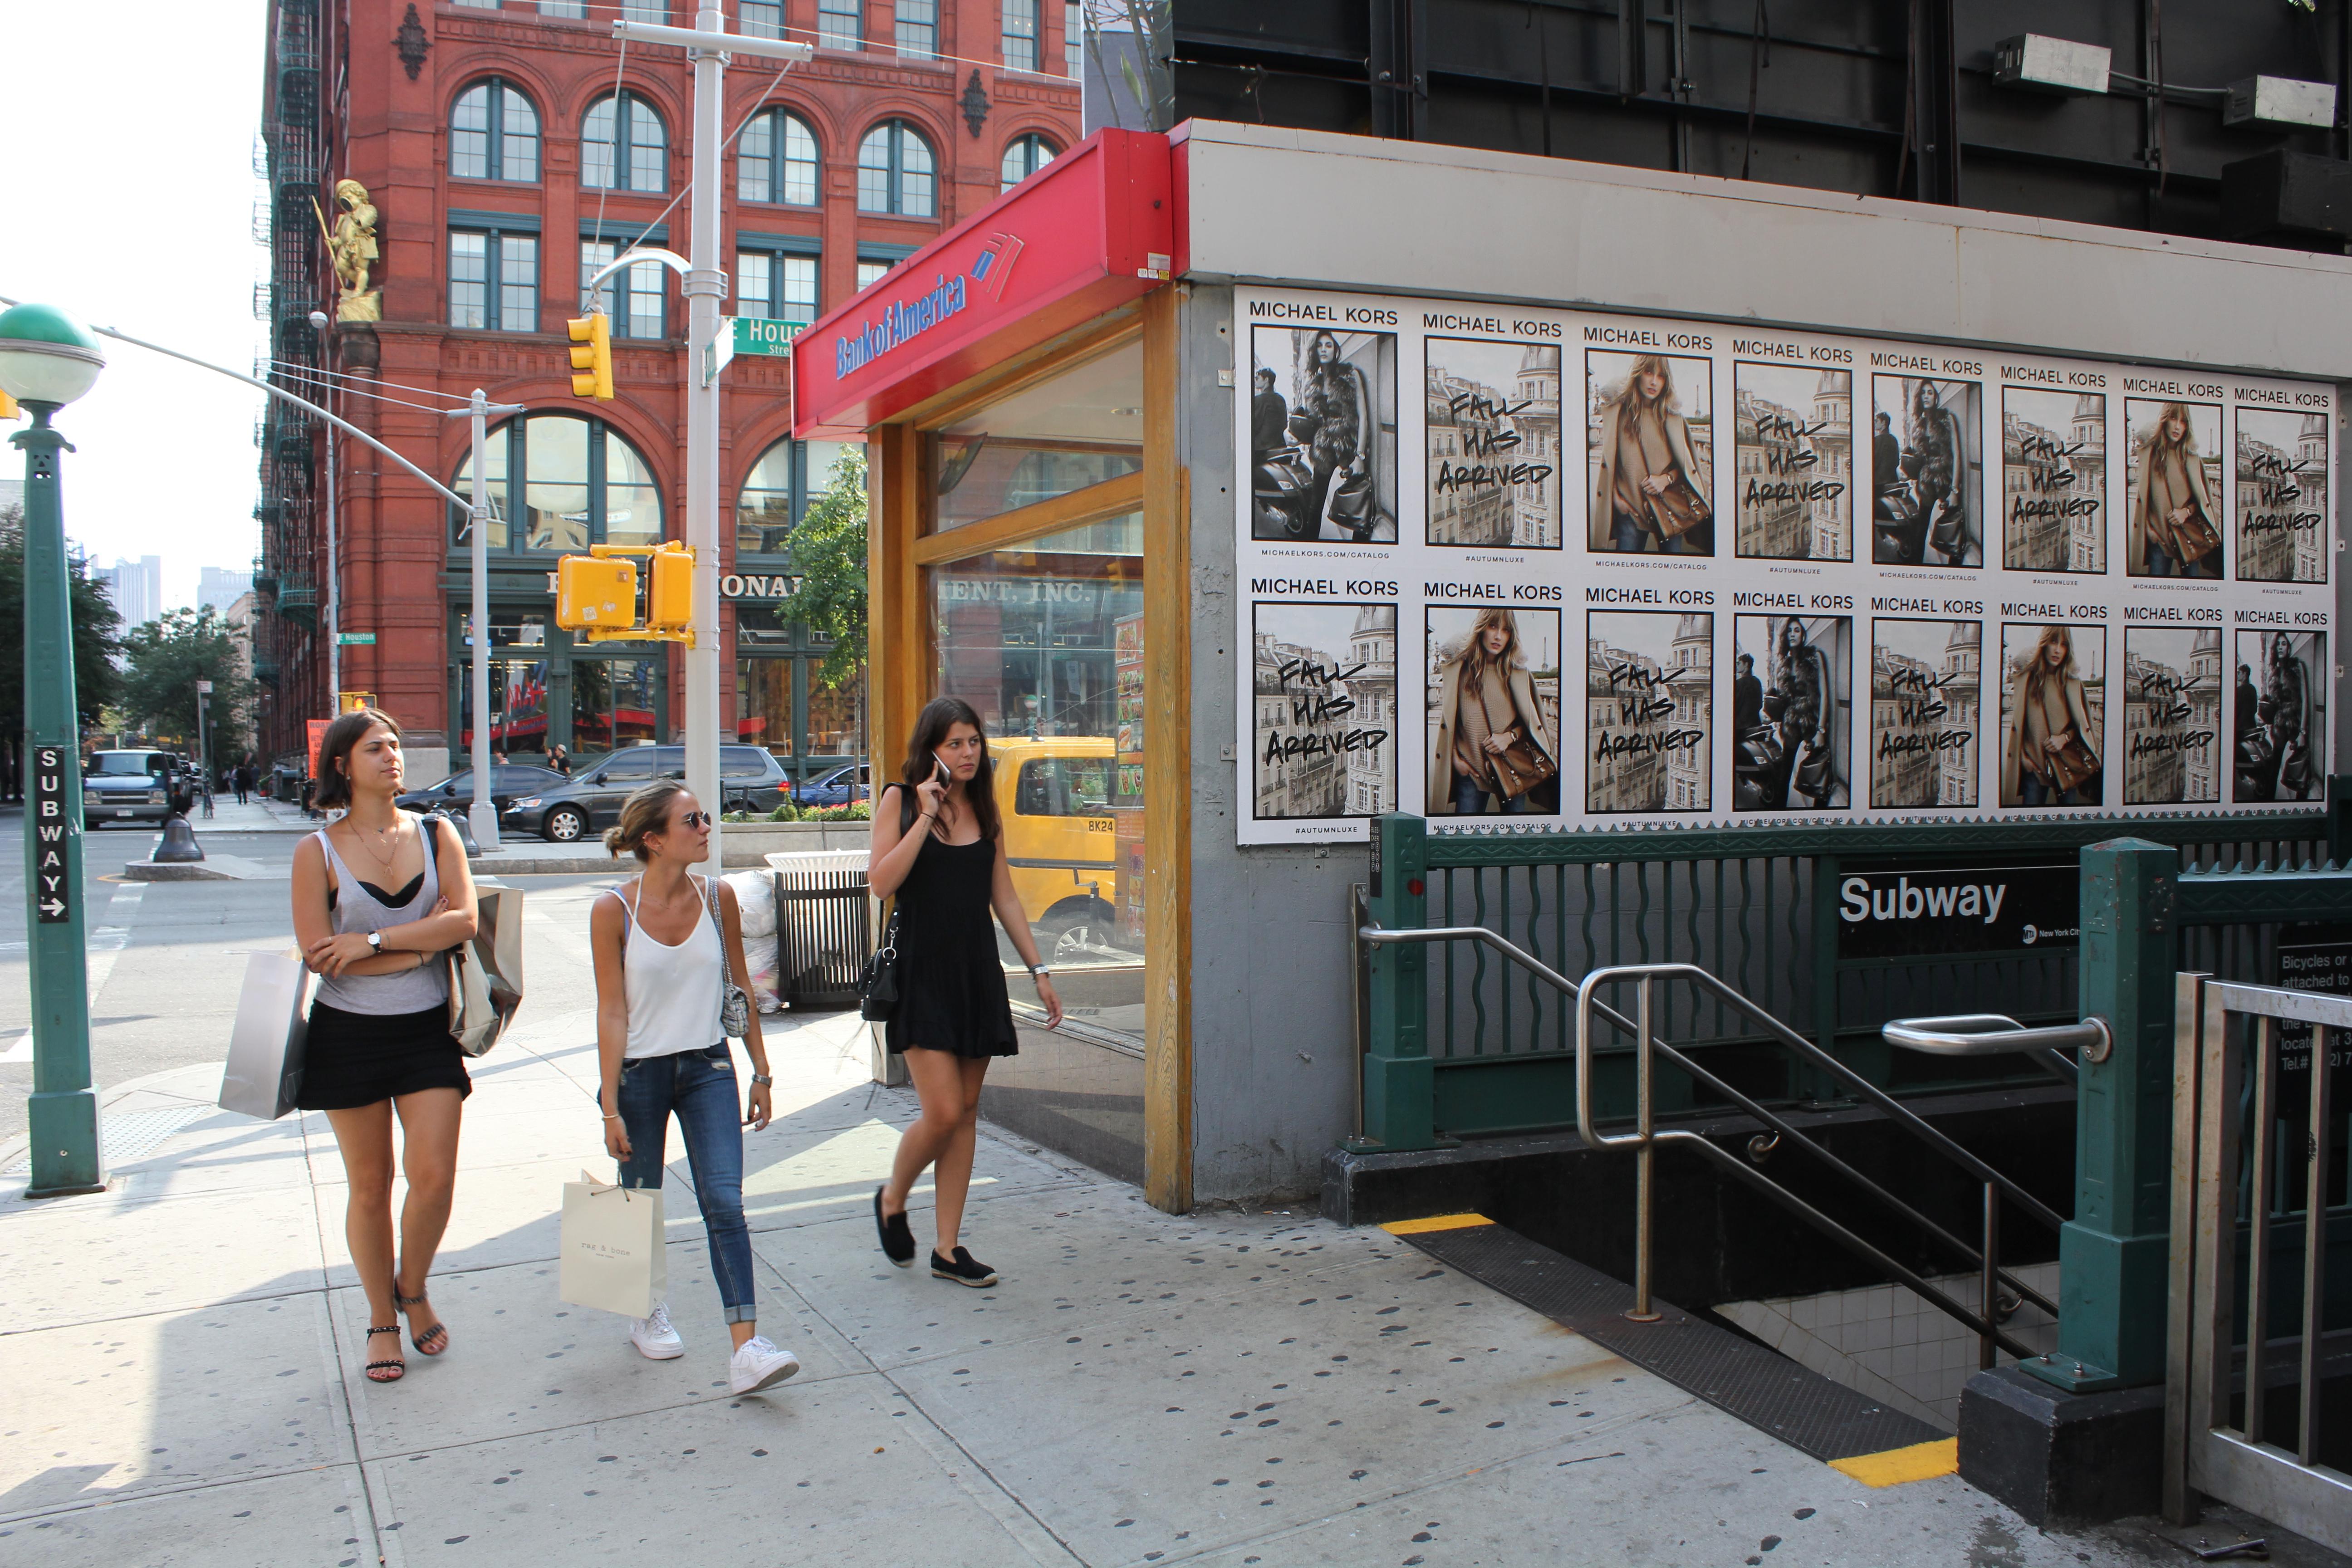 New York Wild Posting